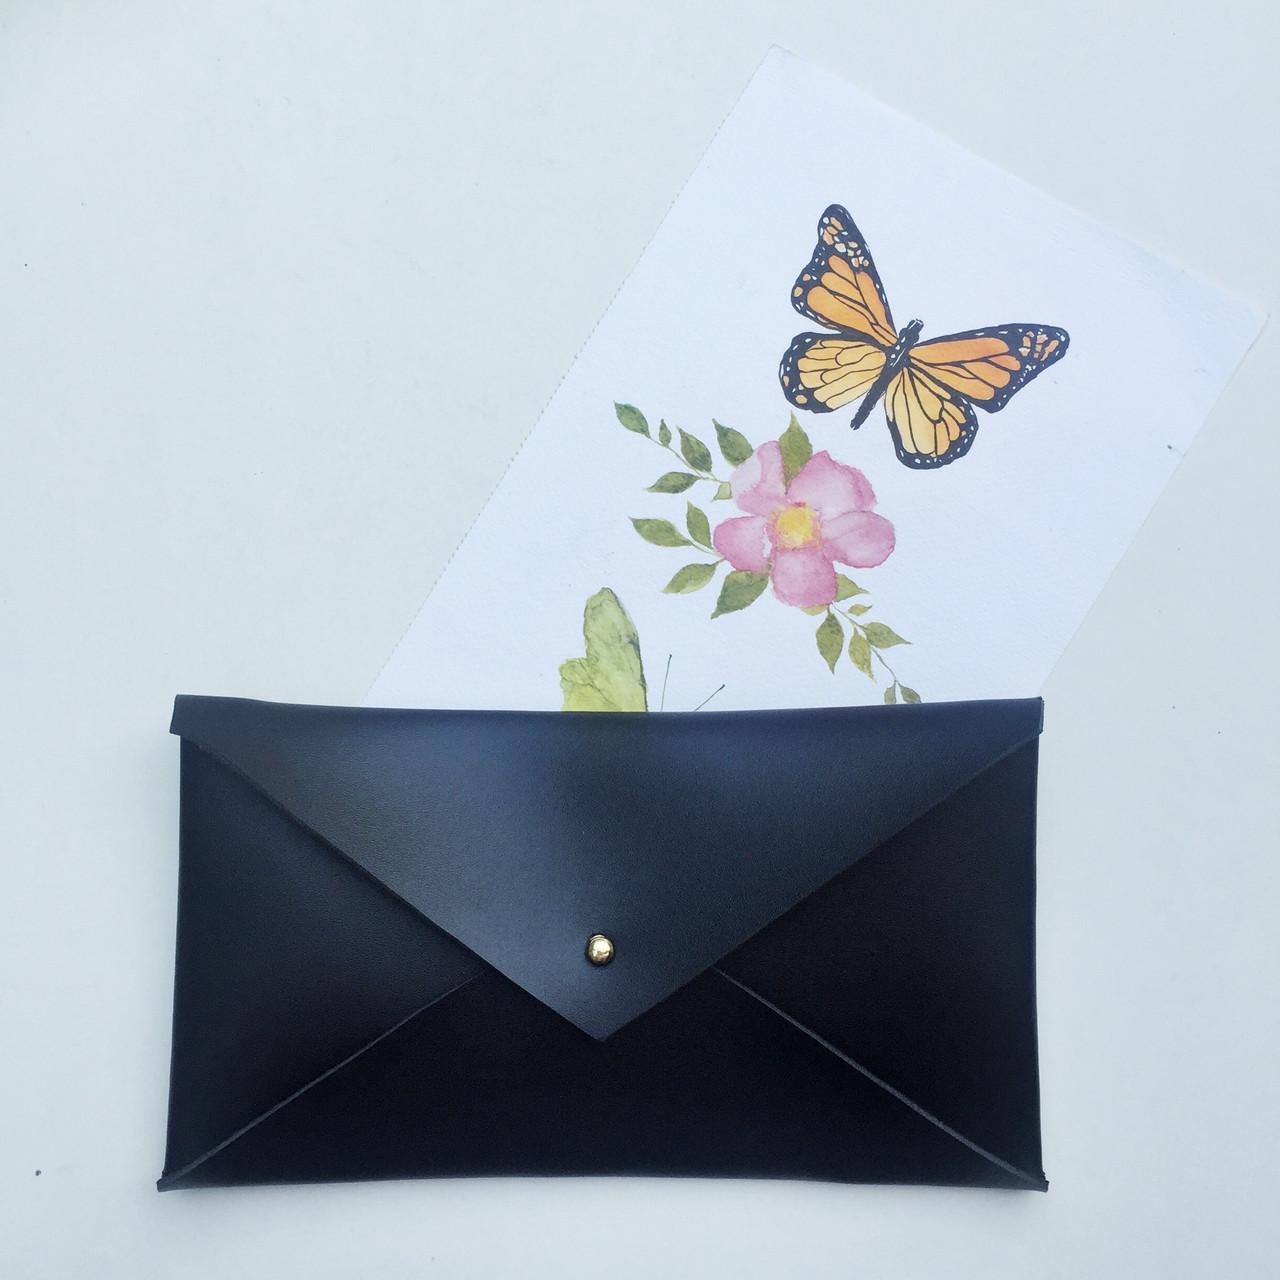 luxuriant in design new lifestyle crazy price Envelope Clutch Black